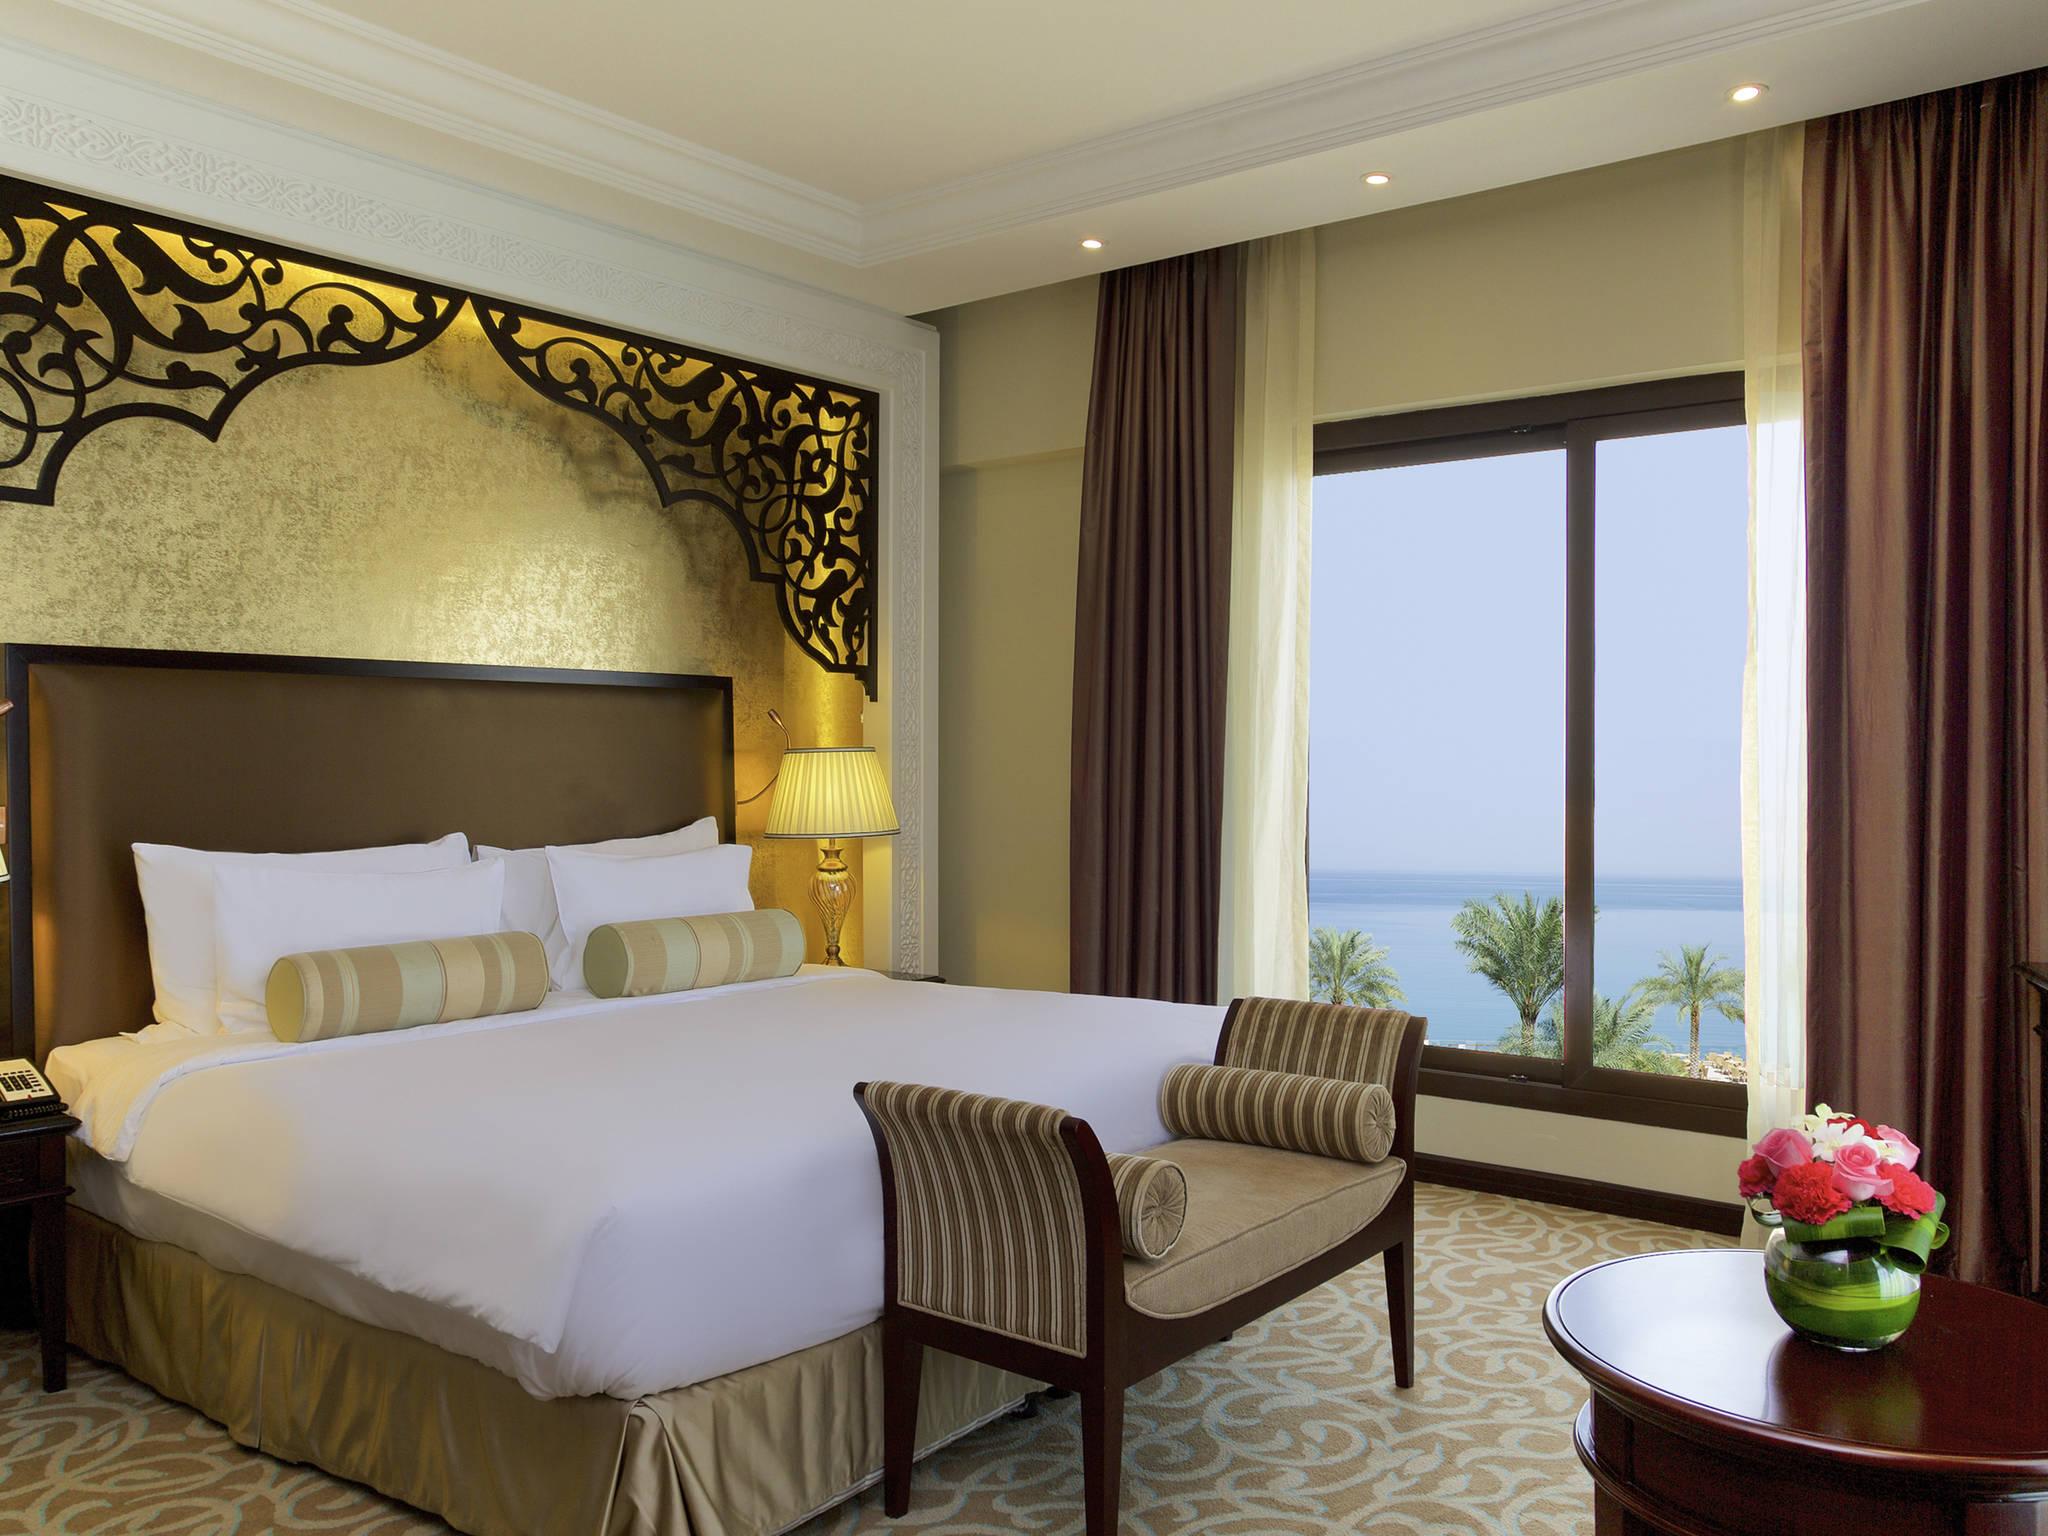 Hotel in RAS AL KHAIMAH Marjan Island Resort Spa